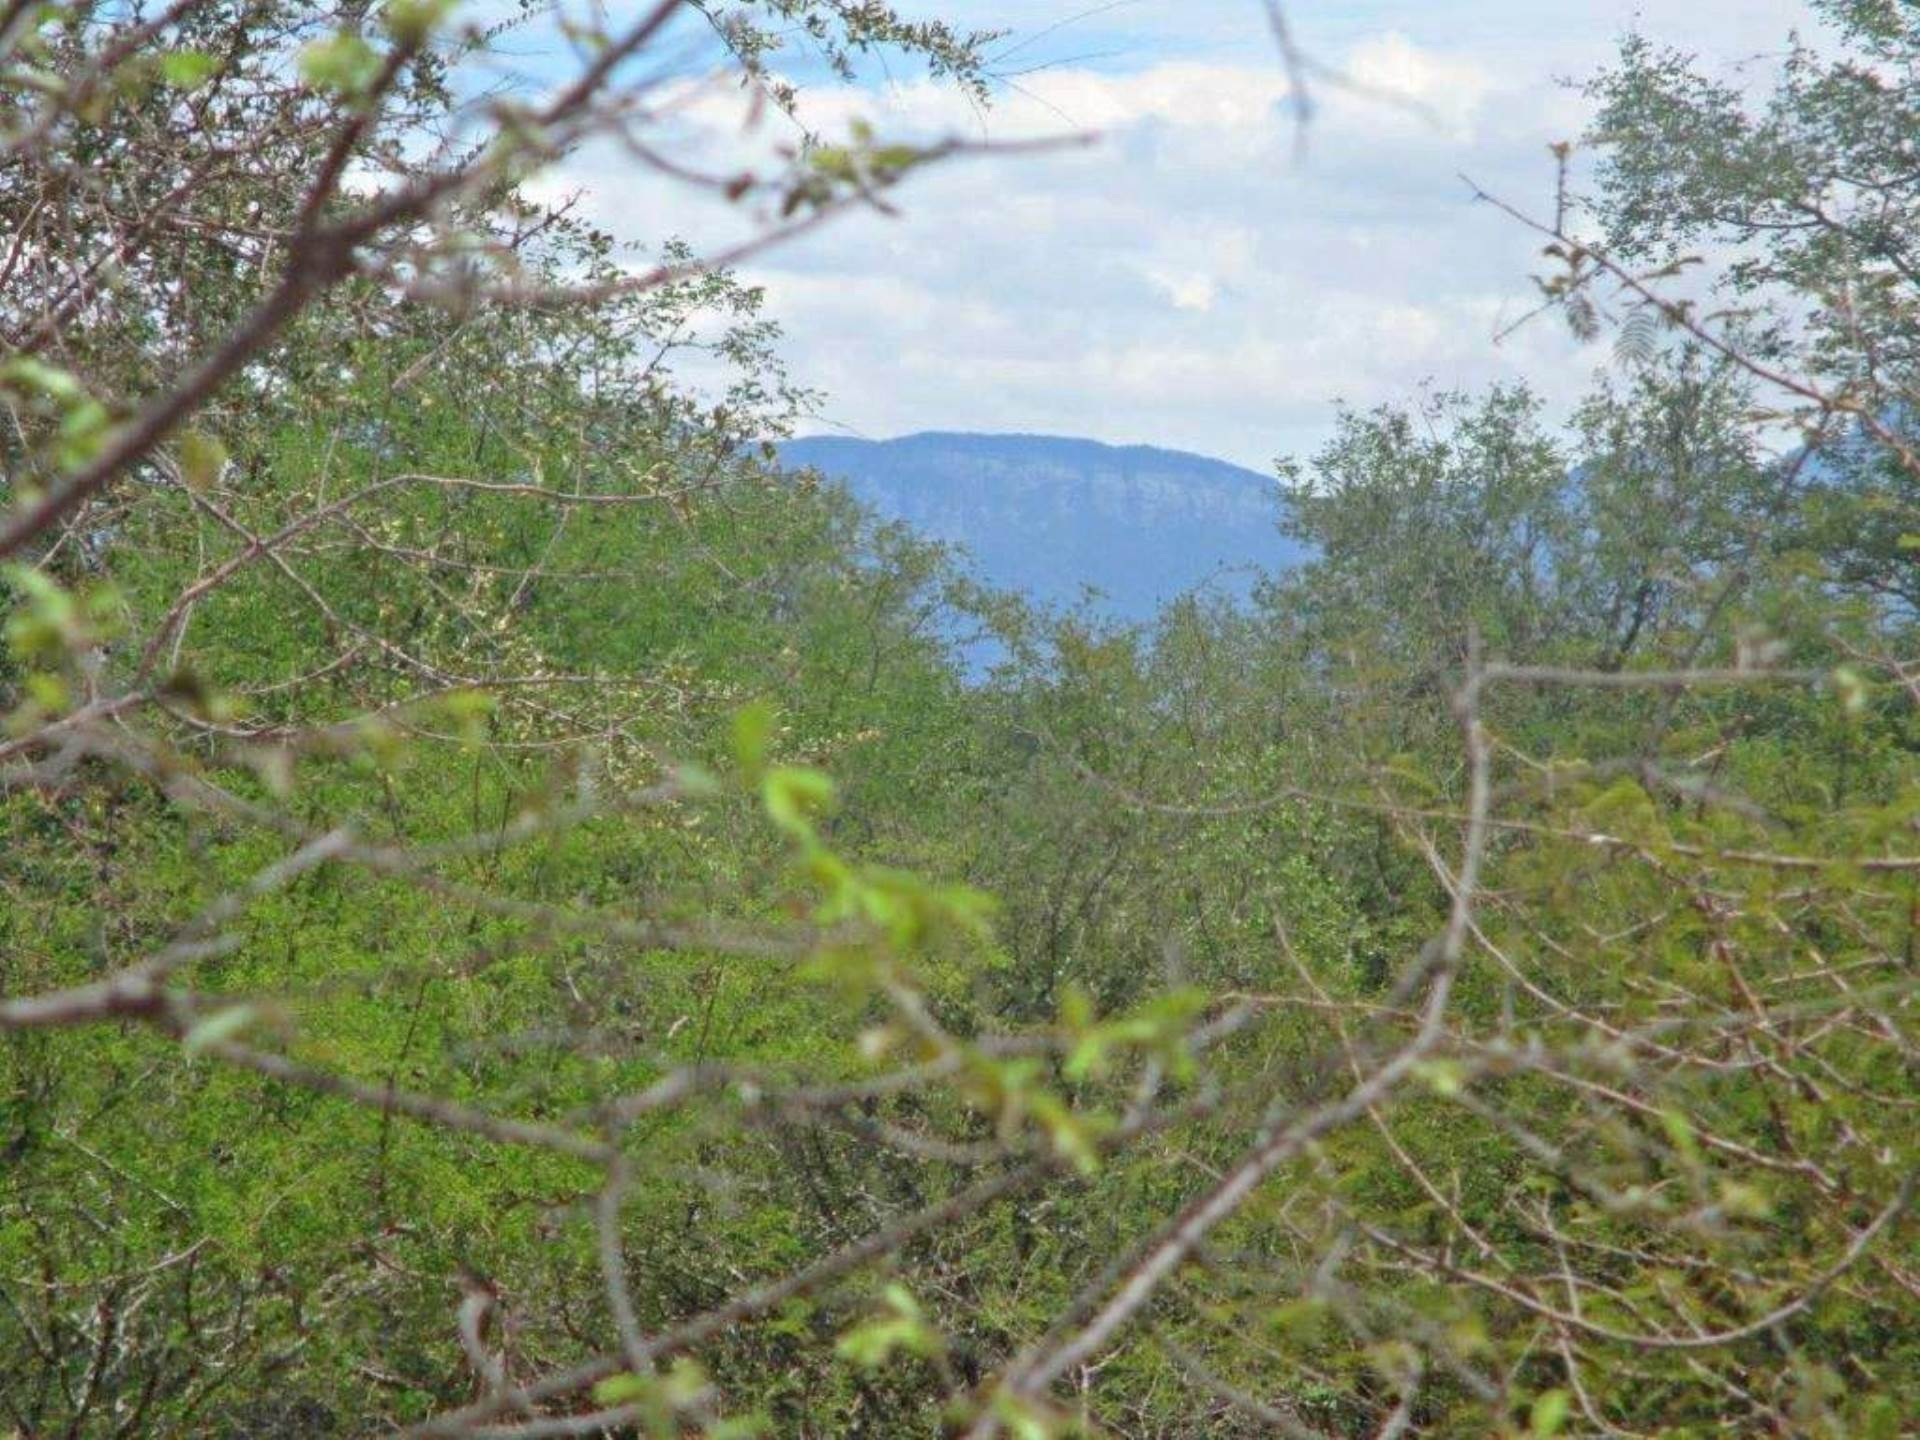 Vacant Land Residential For Sale In Hoedspruit Wildlife Estate